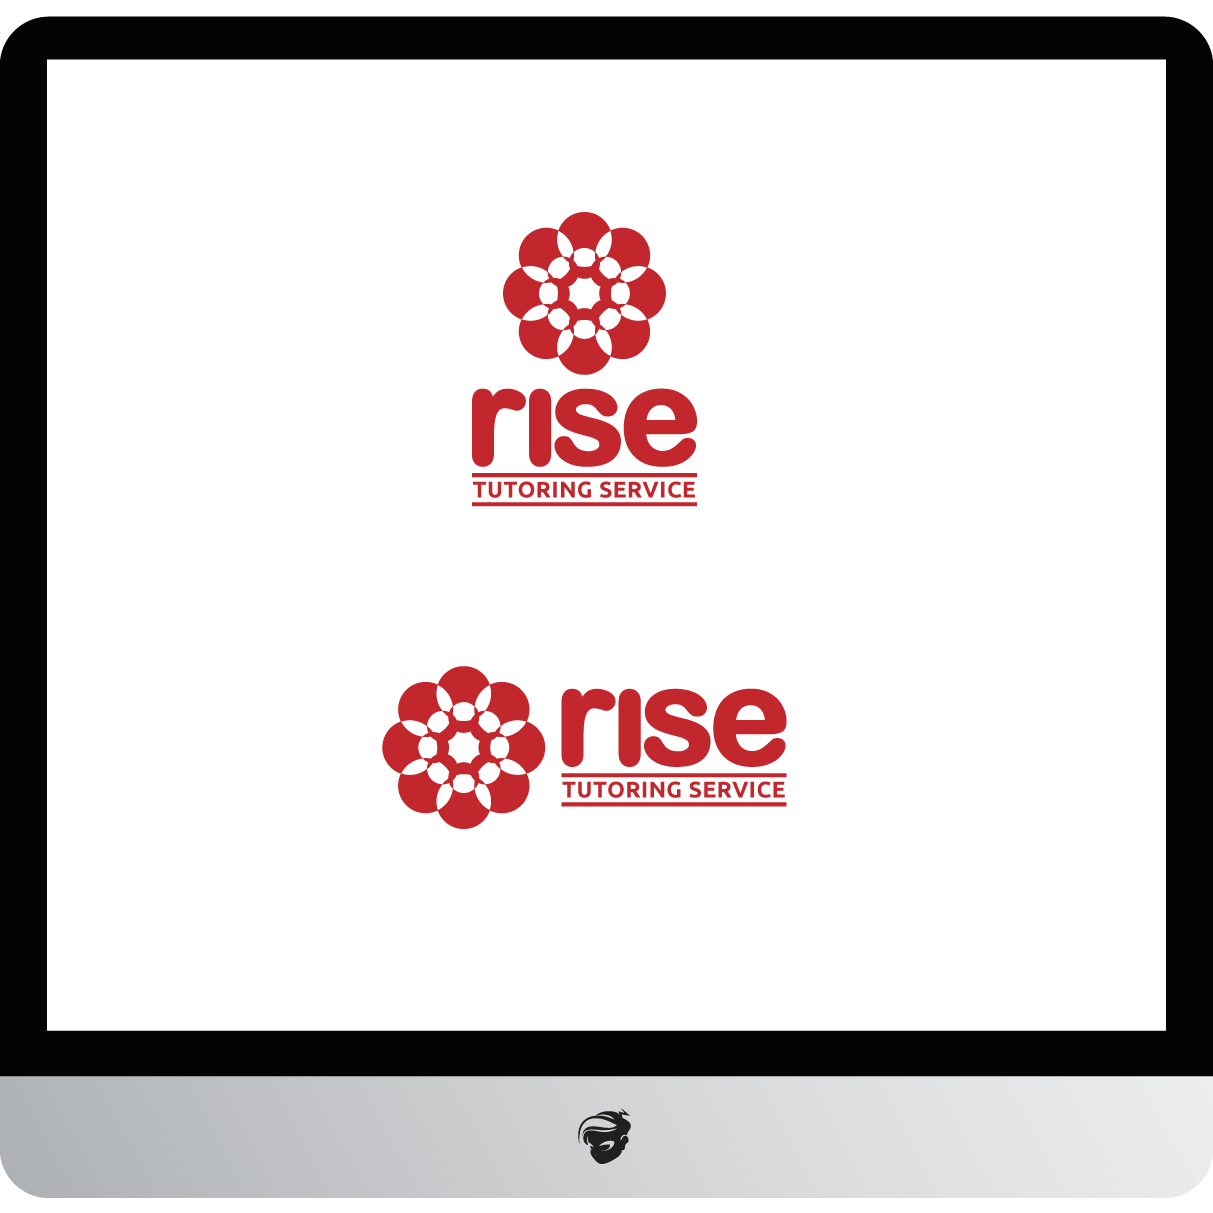 Logo Design by zesthar - Entry No. 233 in the Logo Design Contest Imaginative Logo Design for Rise Tutoring Service.